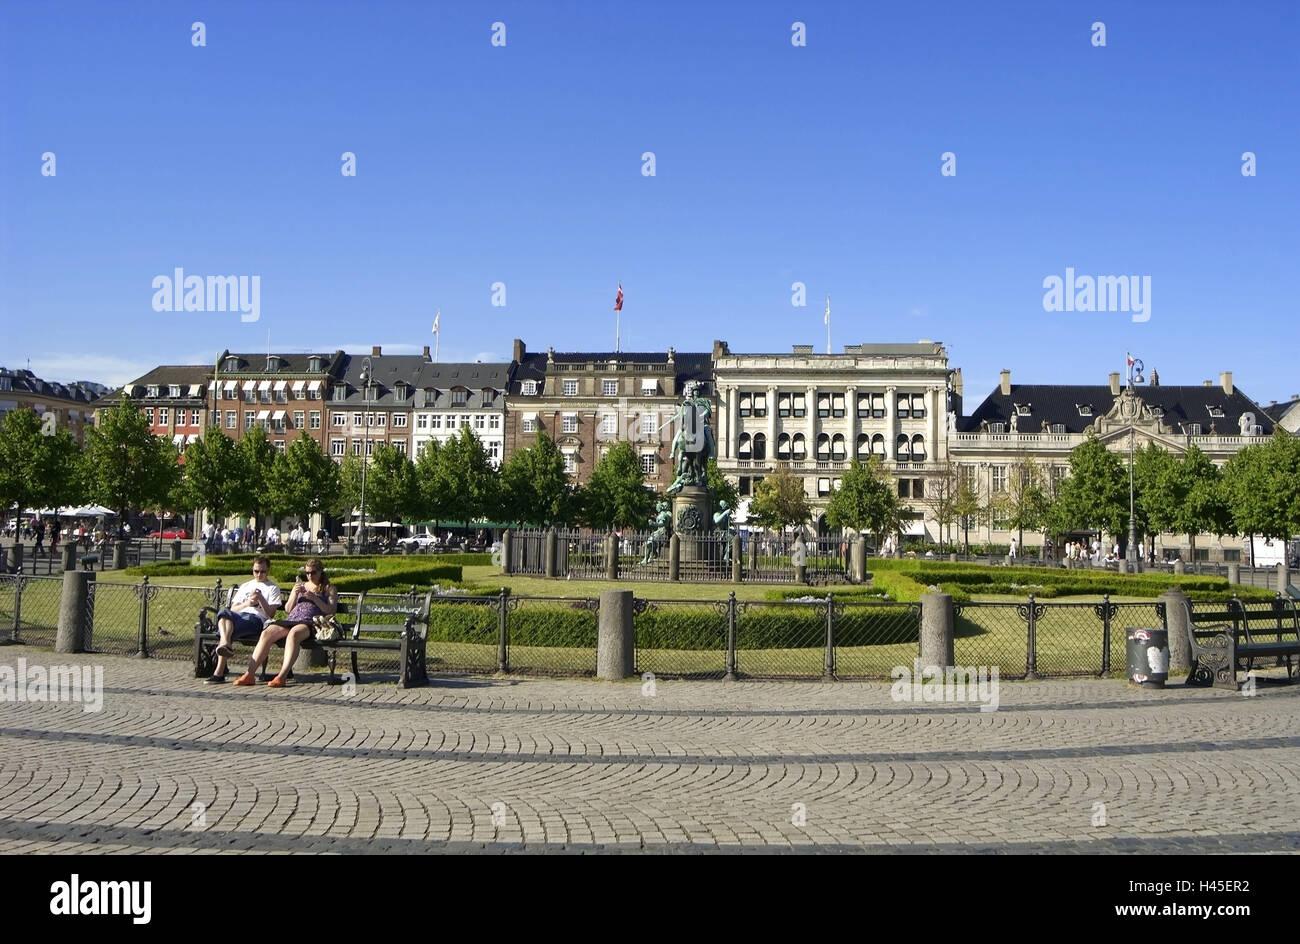 Denmark, Copenhagen, Kongens Nytorv, terrace, meadow, equestrian statue, park-bench, tourist, no model release, - Stock Image